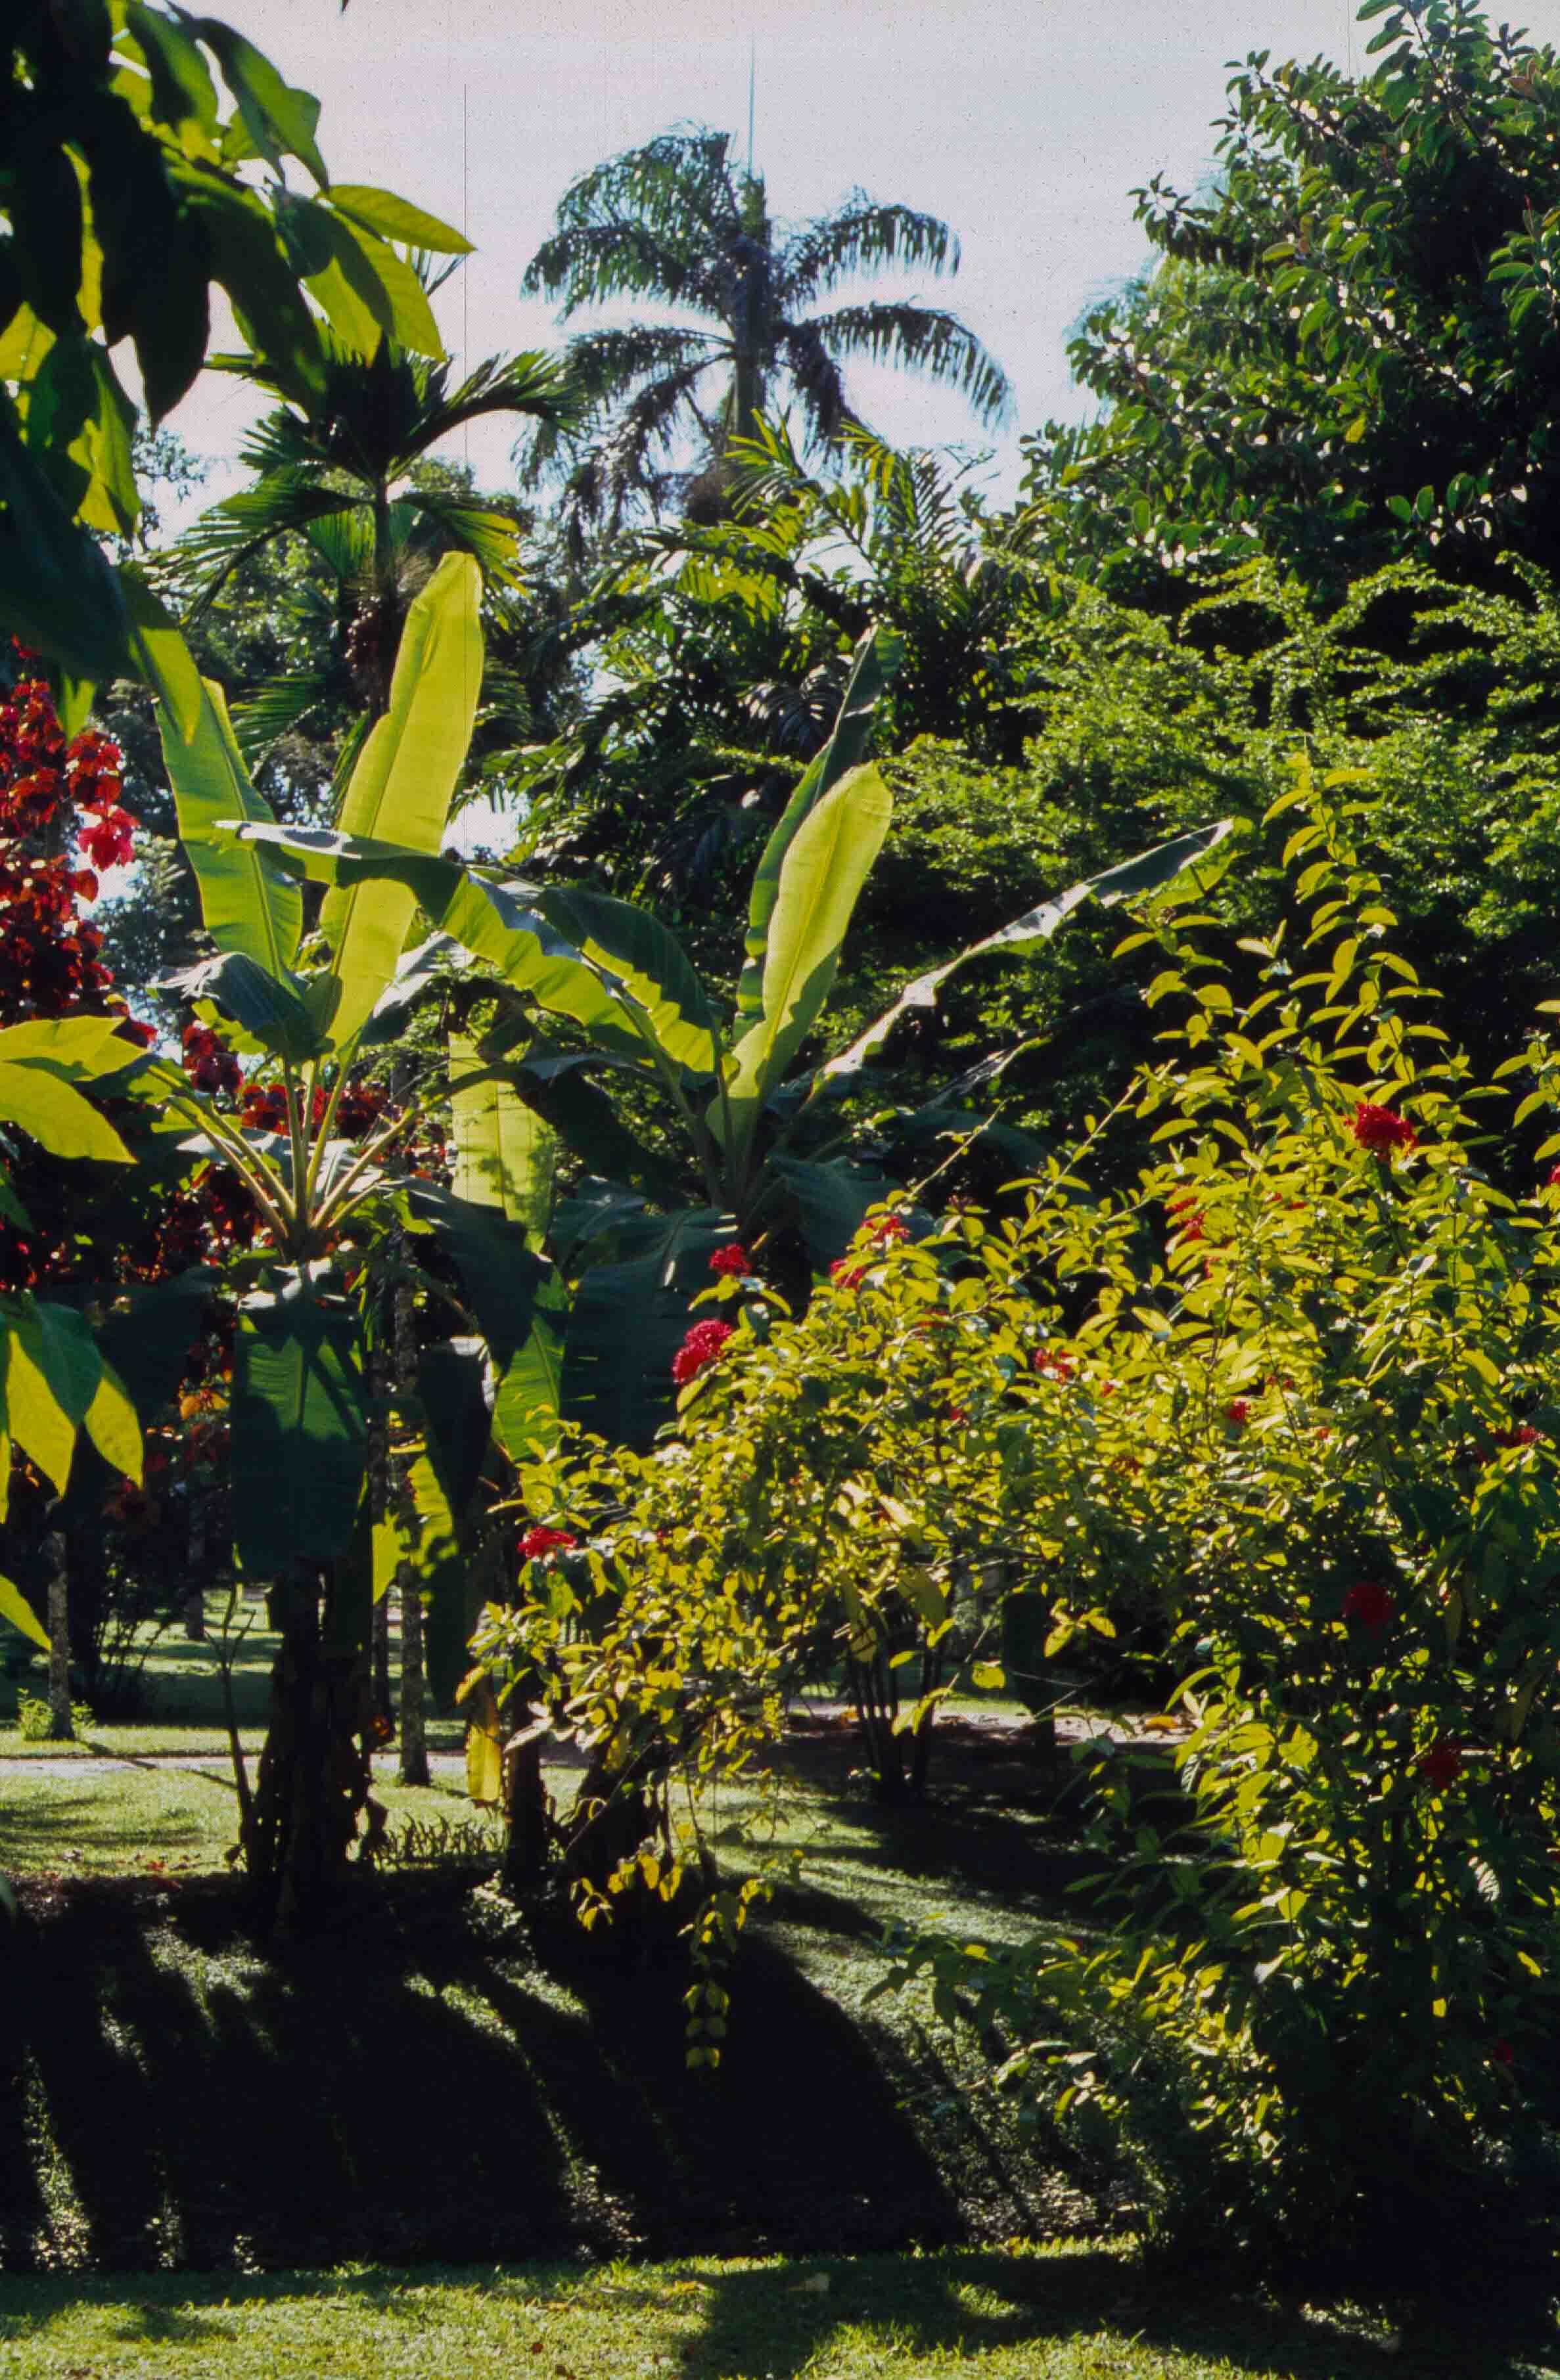 239. Suriname